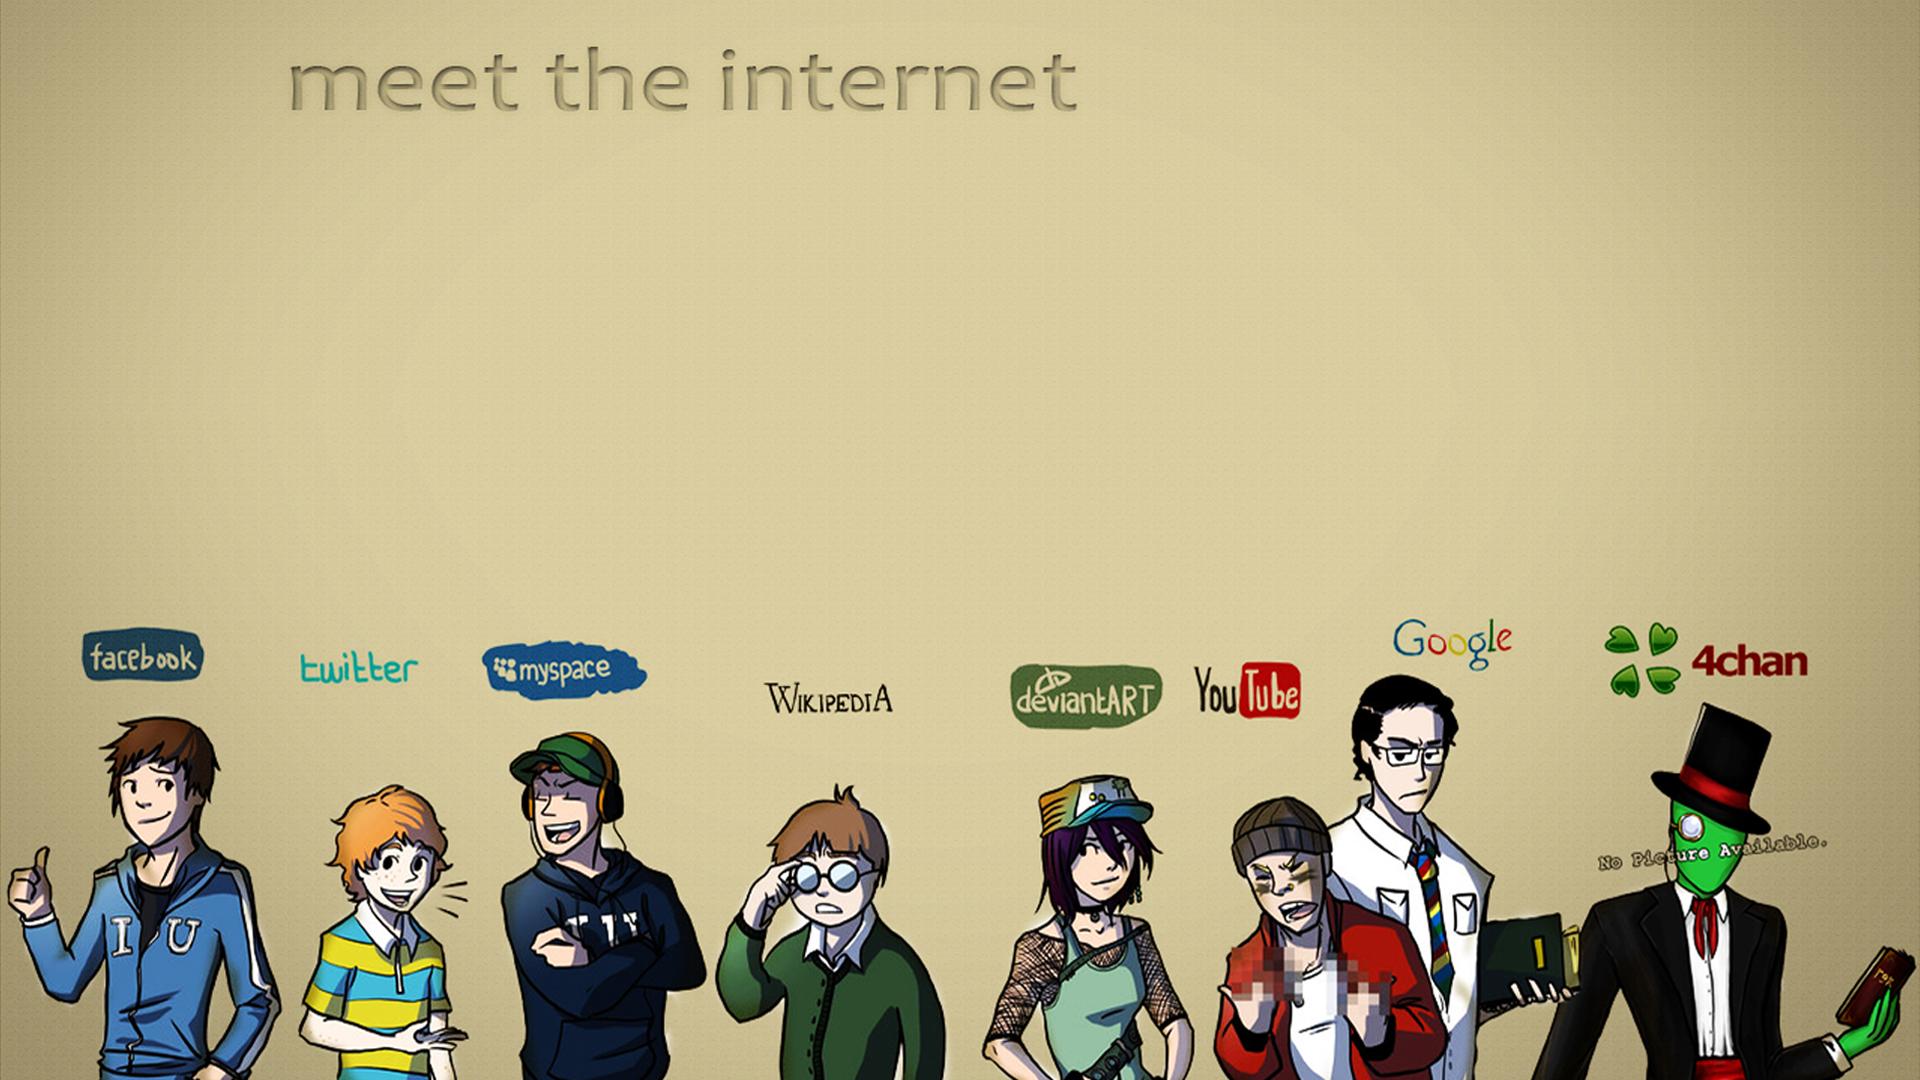 Illustration digital art deviantart internet youtube cartoon 4chan brand facebook twitter google wikipedia myspace presentation